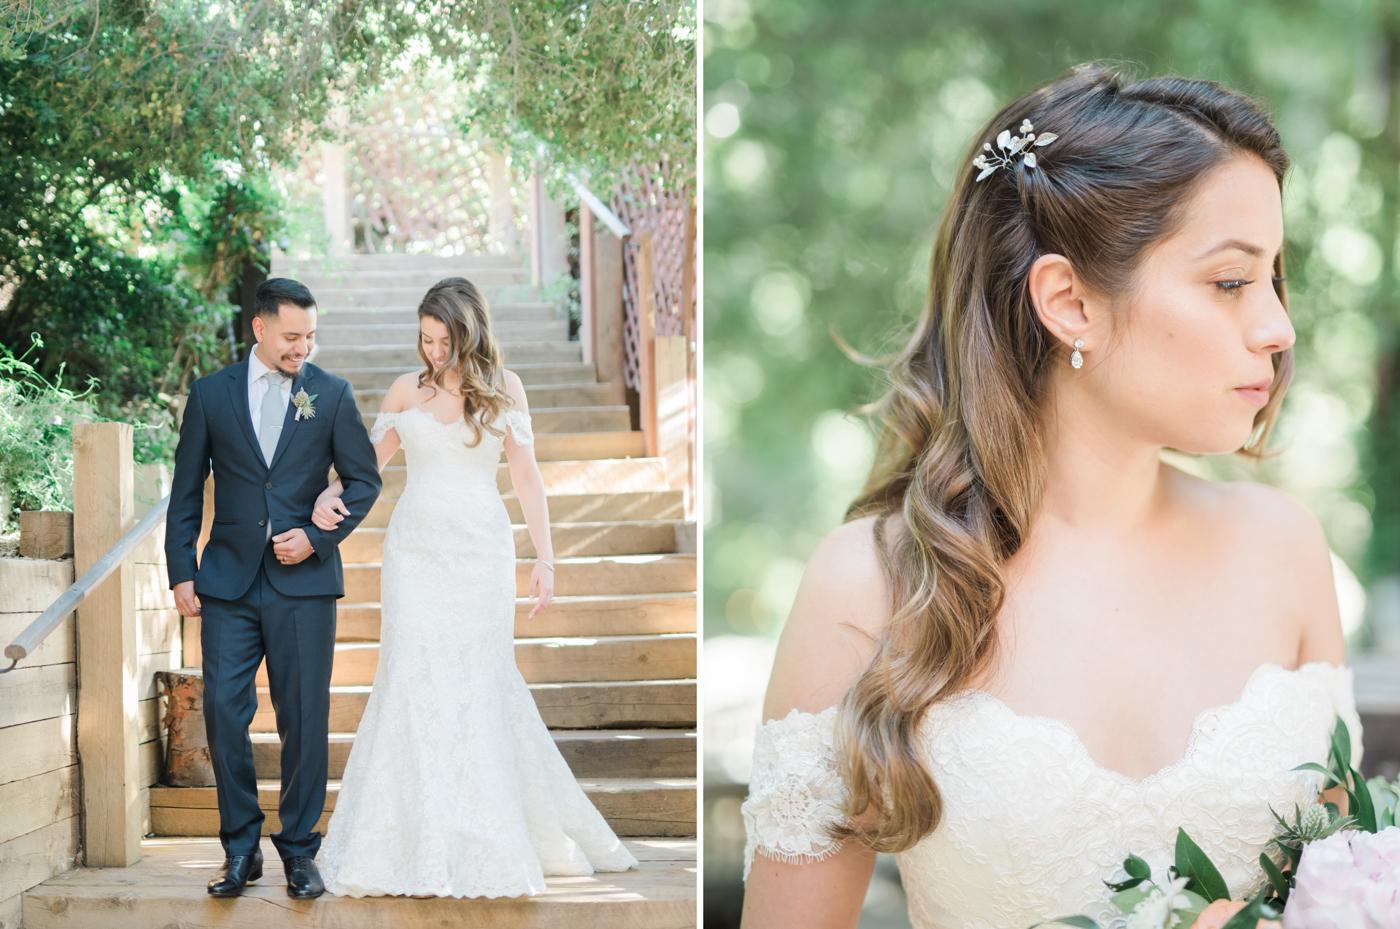 l&c-the_1909_spring_garden_wedding_los_angeles_fine_art_wedding_photographer-19.jpg